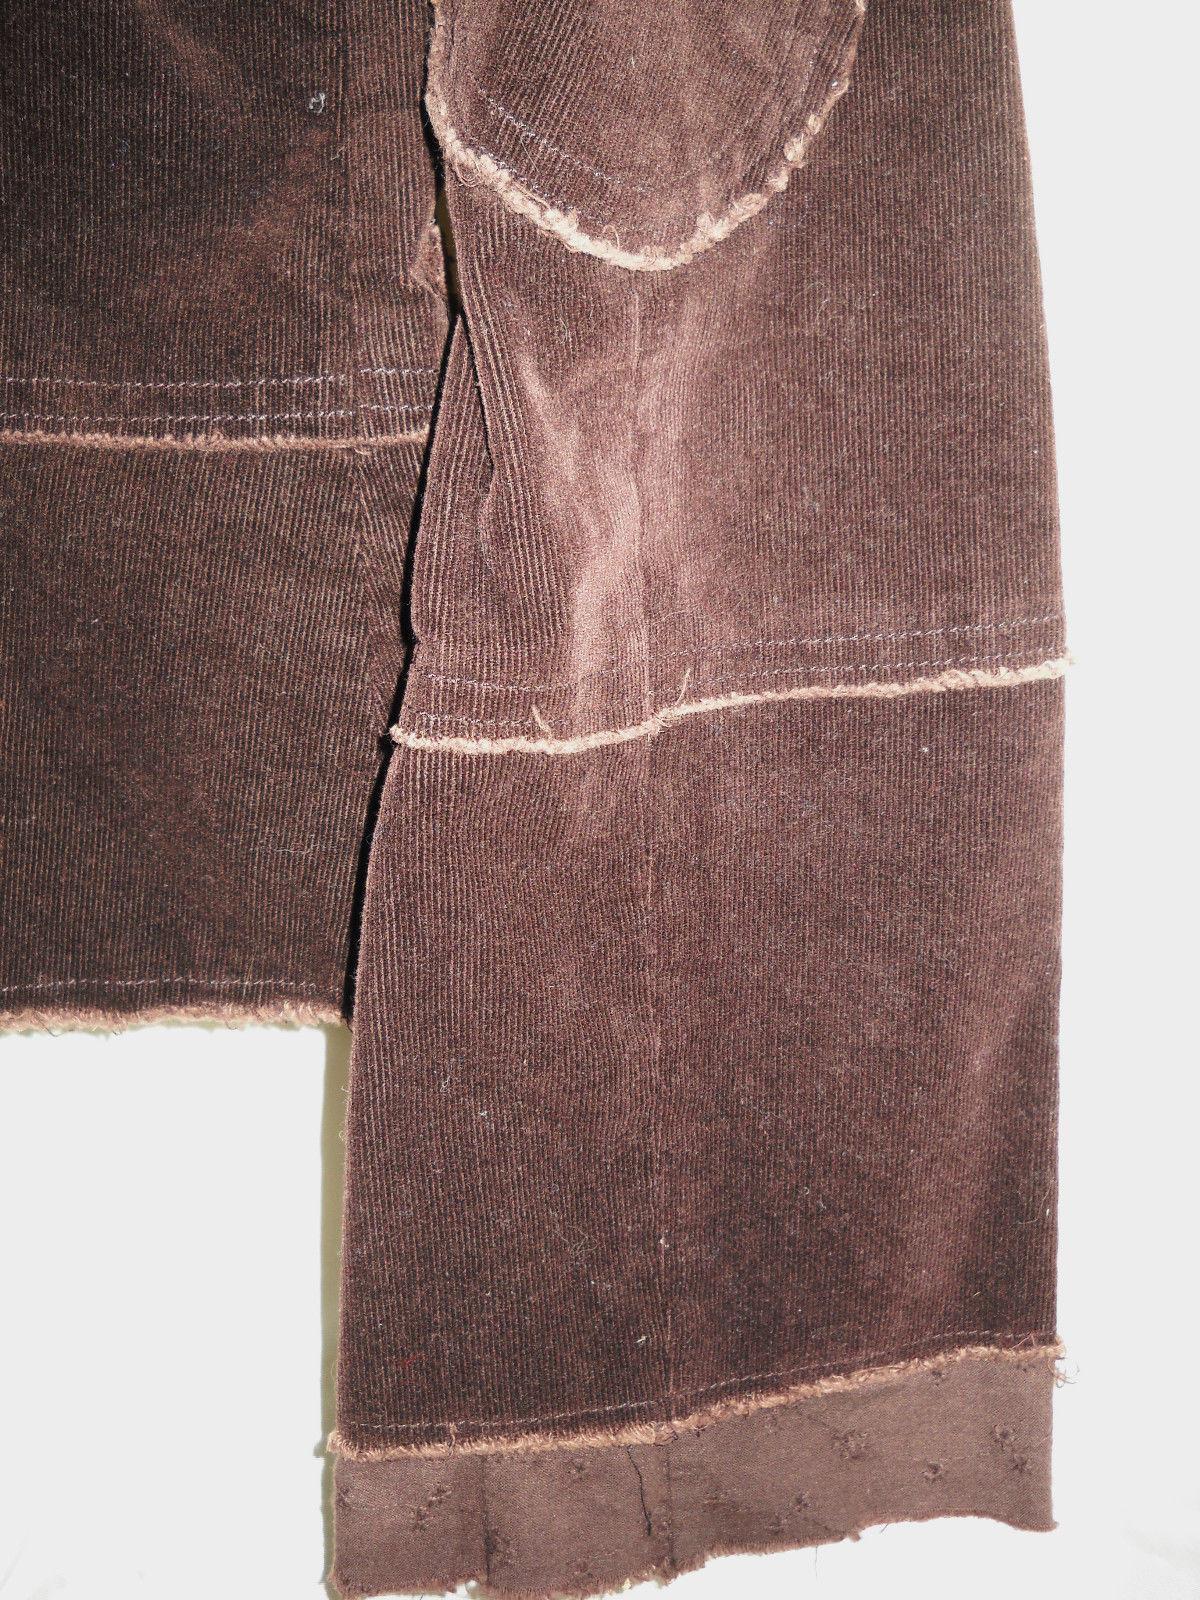 Joystick brown fall cotton corduroy embroidered jacket